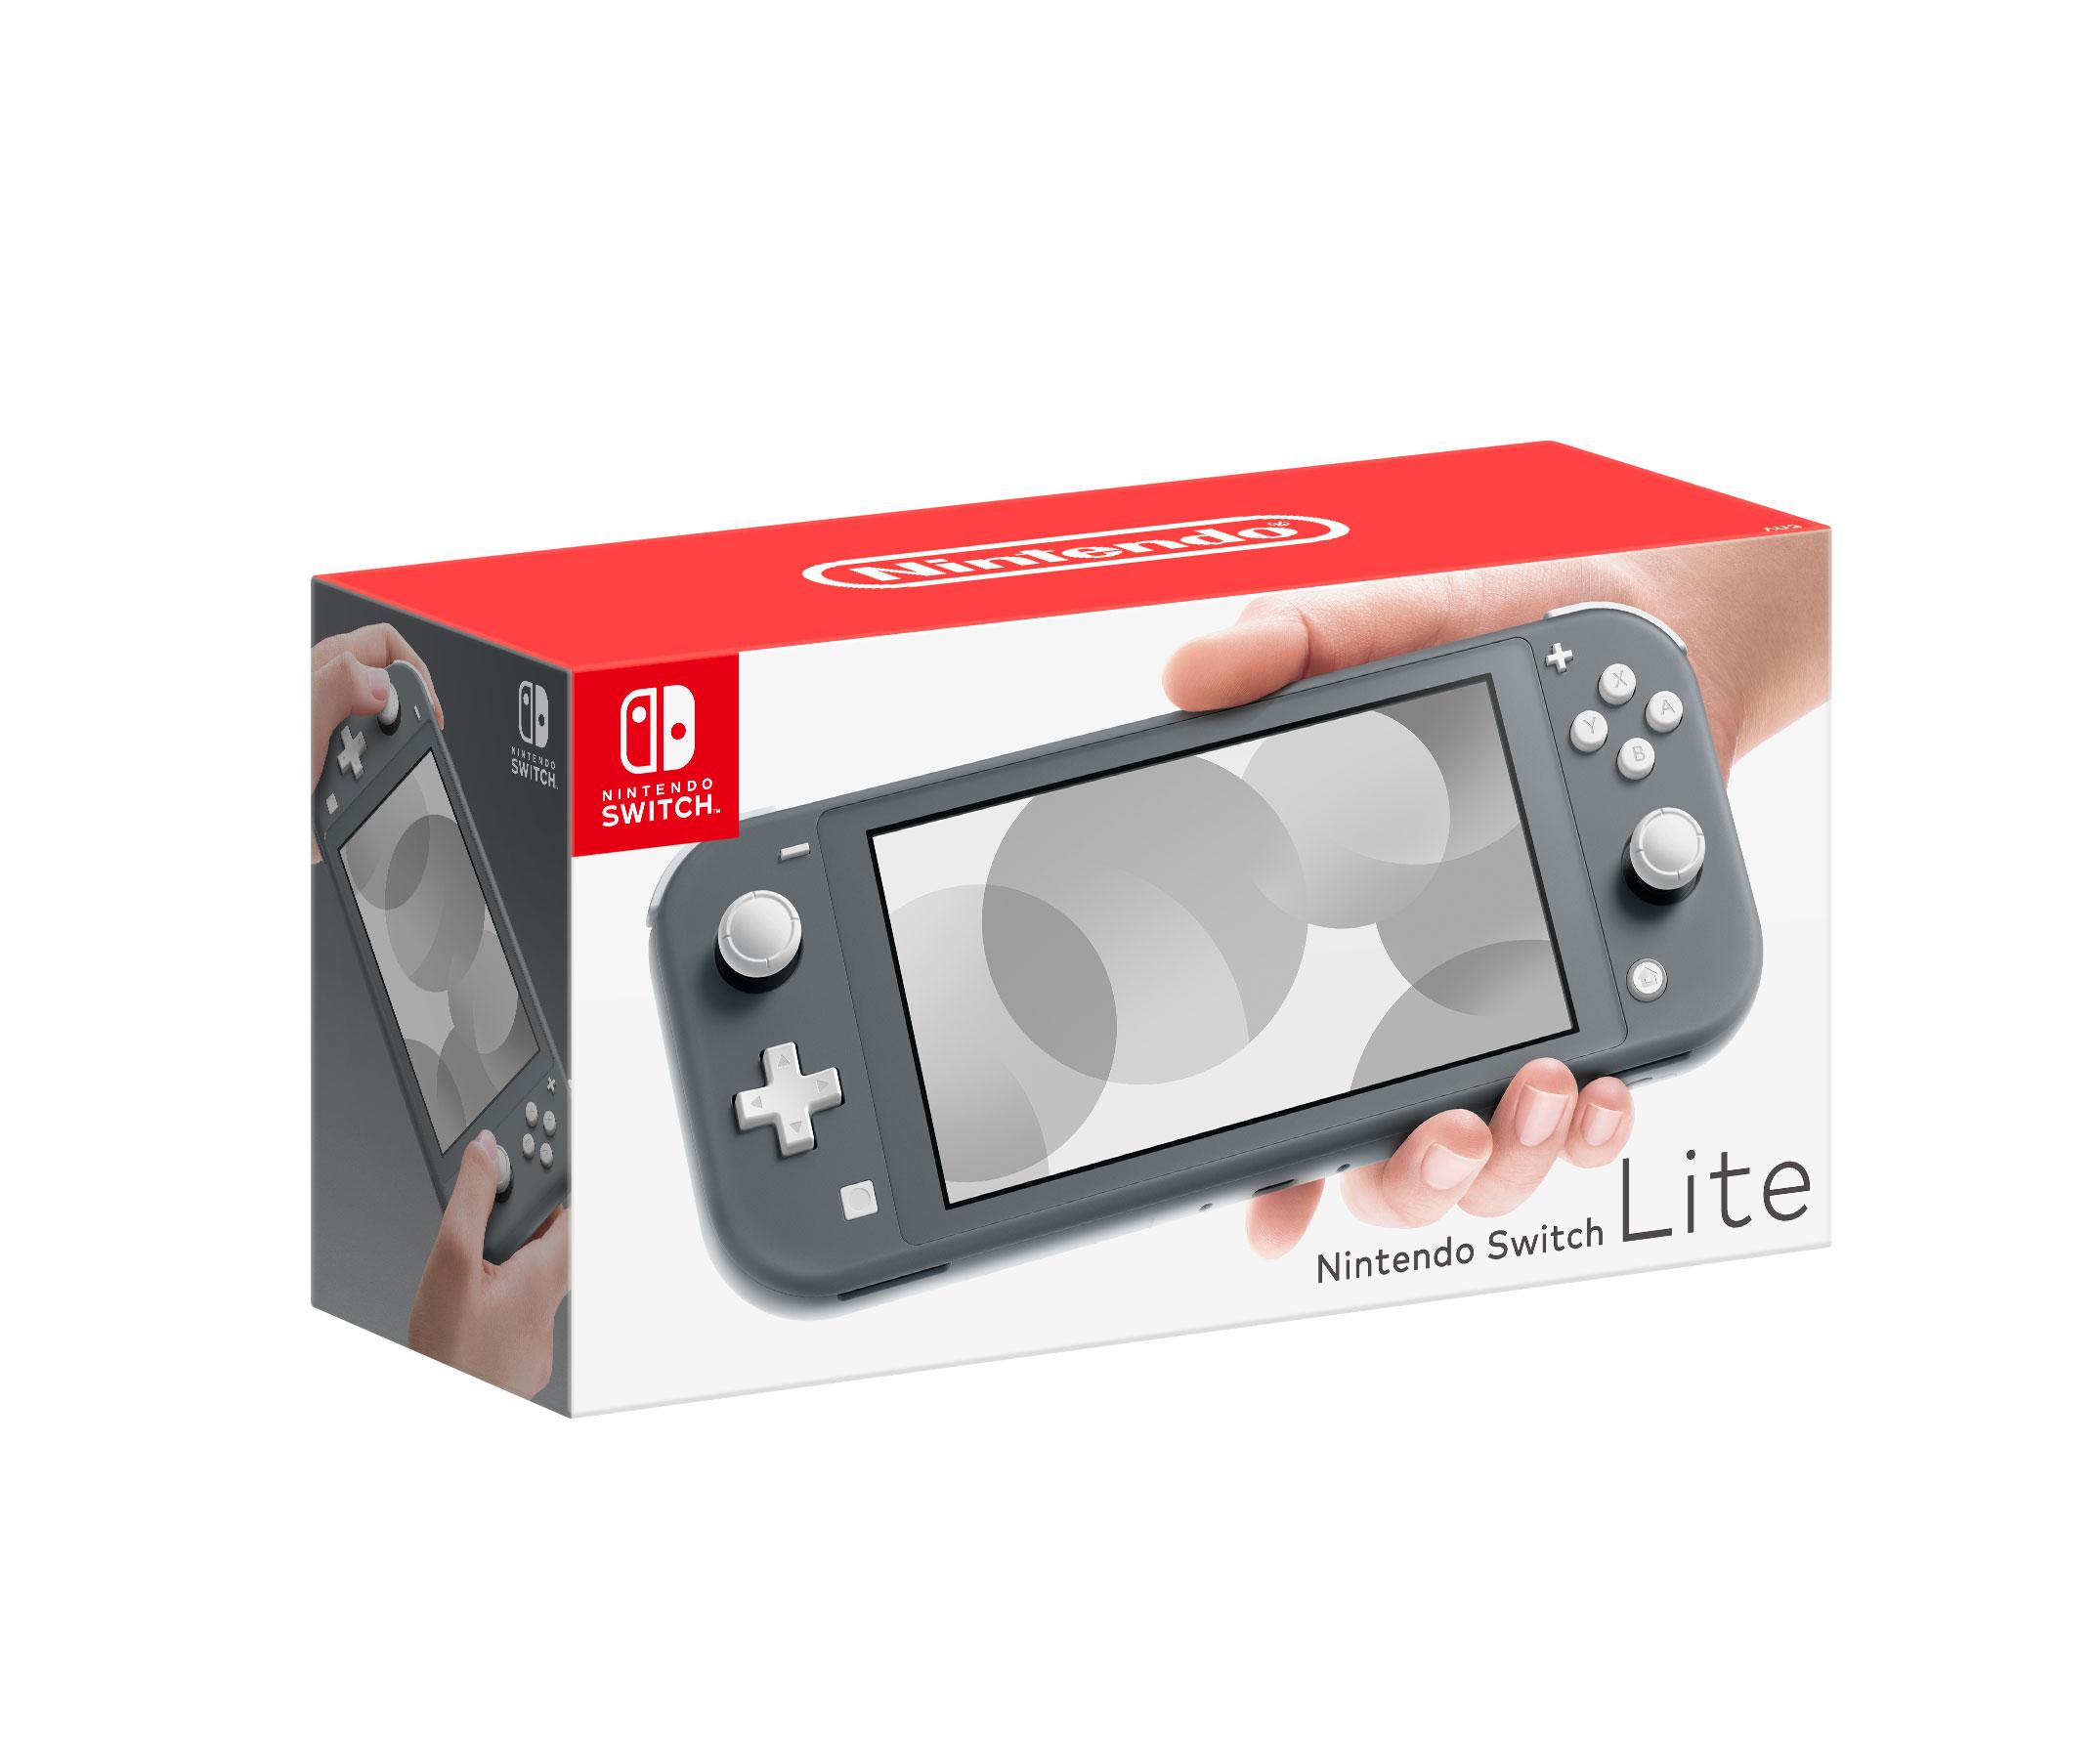 Nintendo Switch Lite - Grey Packshot.jpg